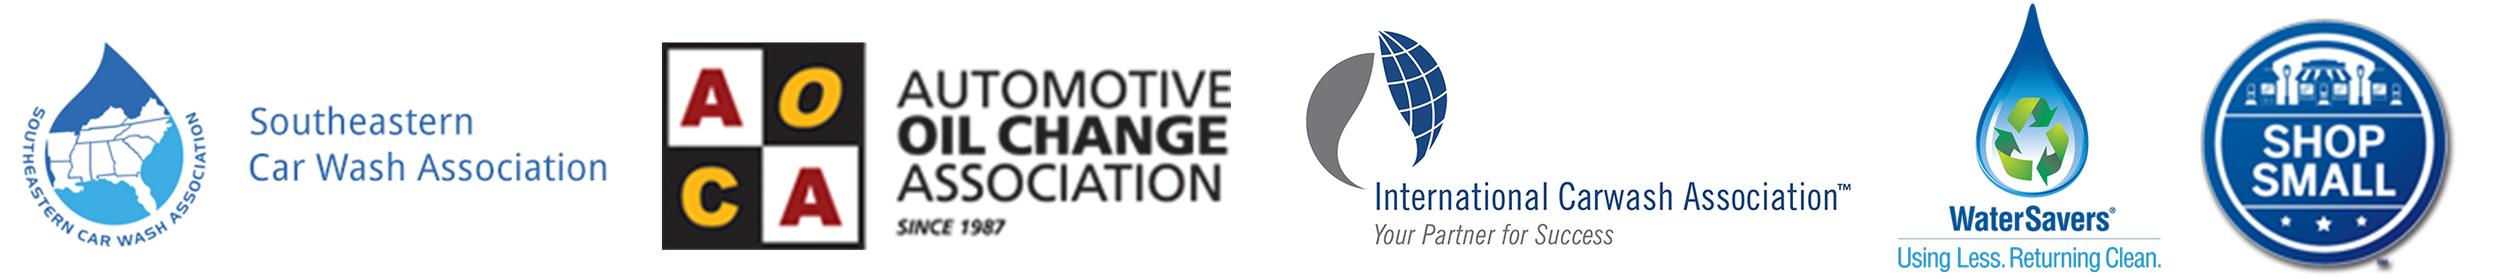 Pronto Car Wash Association Logos